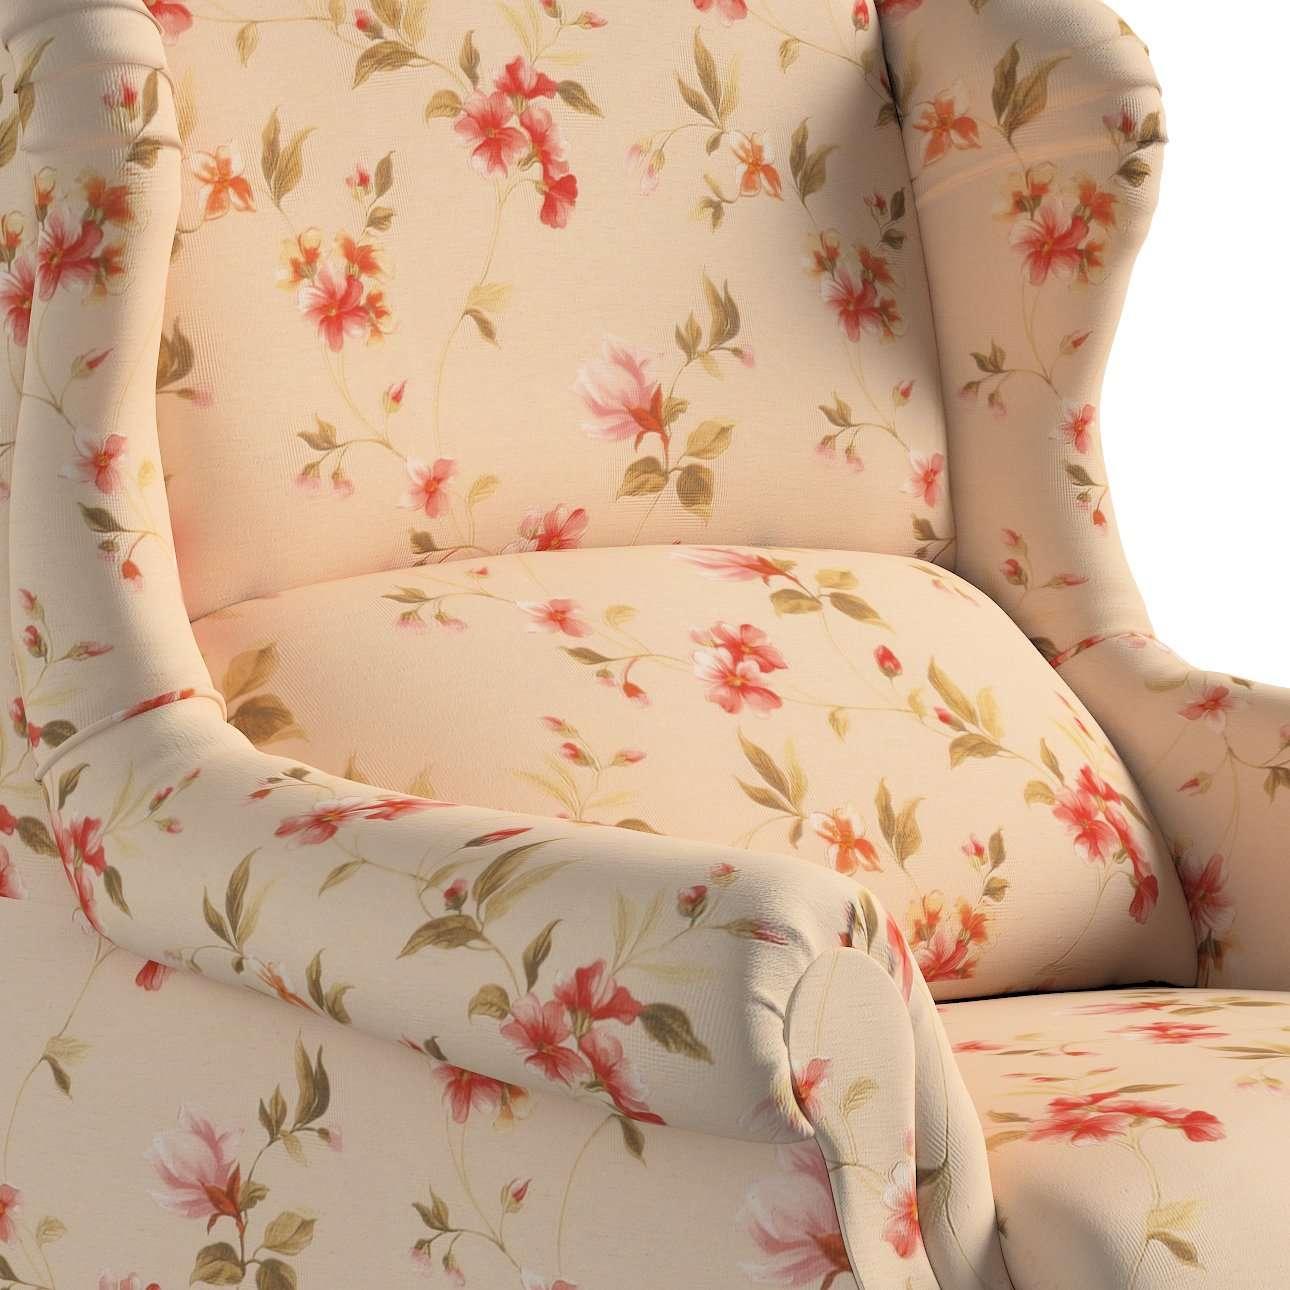 Fotel Unique w kolekcji Londres, tkanina: 124-05